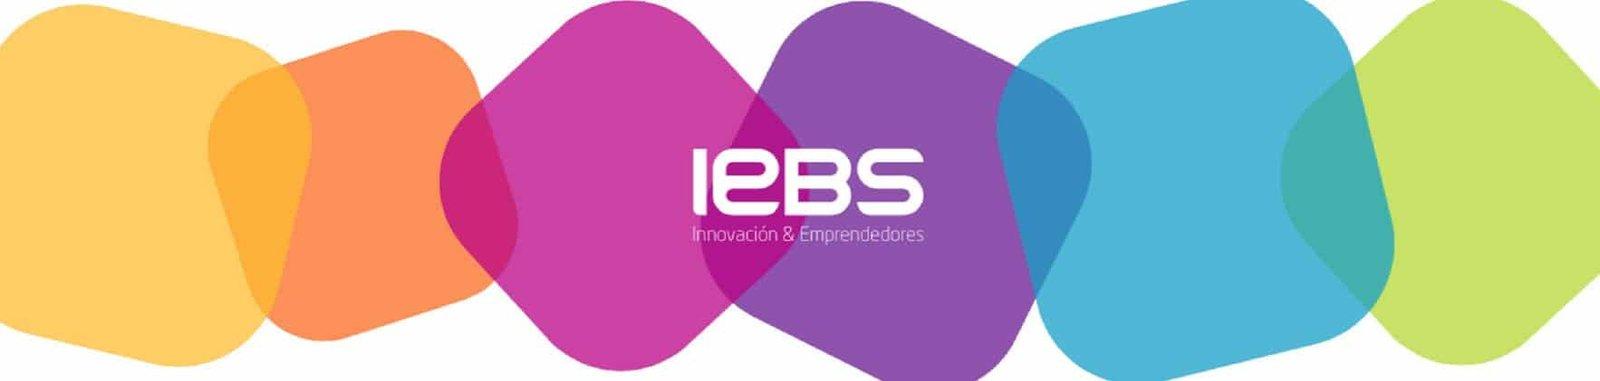 IEBS - Innovation & Entrepreneurship Business School